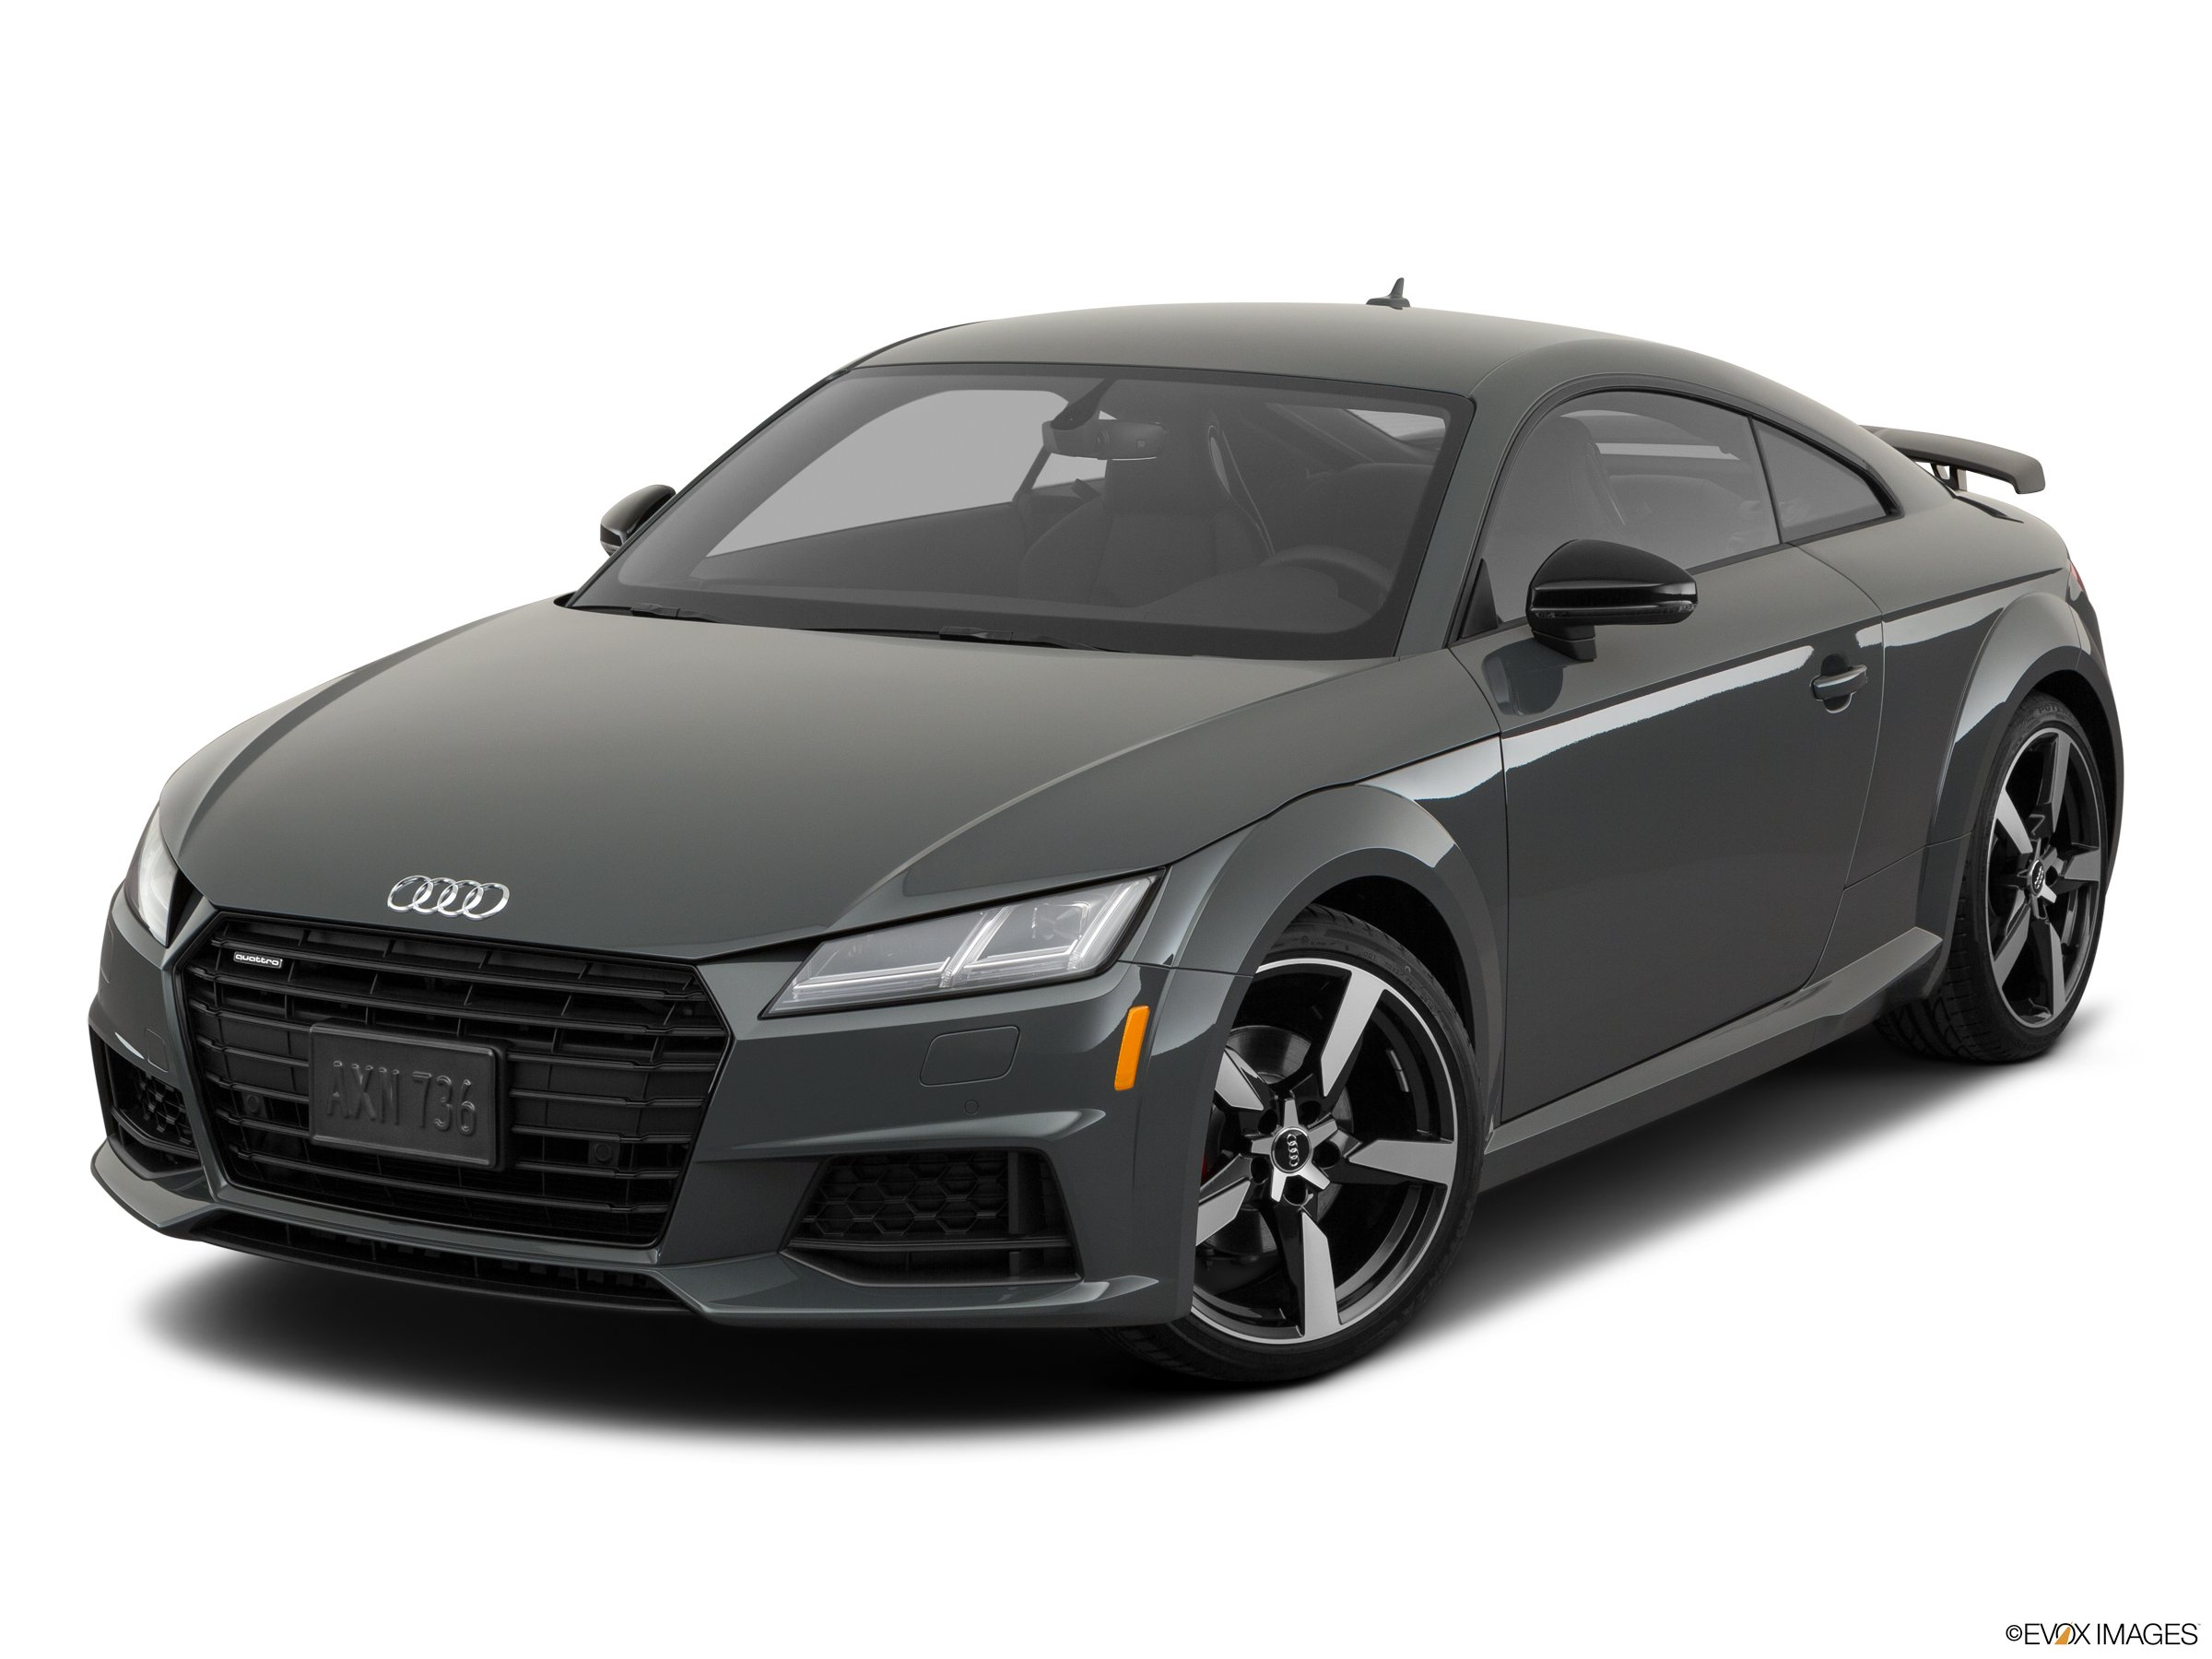 2020 Audi TT 2.0 TFSI AWD coupe